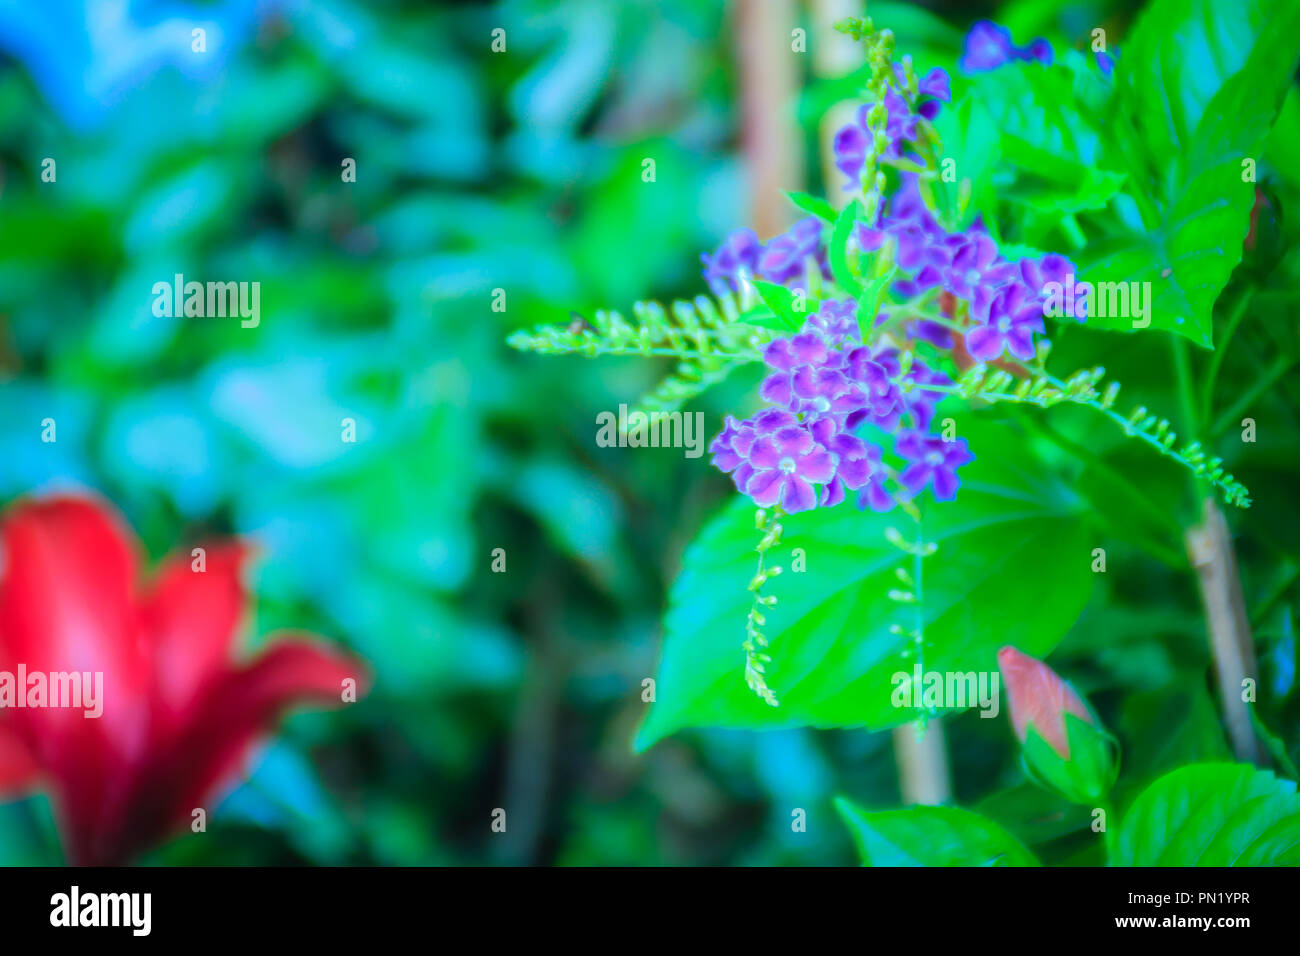 Duranta erecta purple flowers between red flowers common names also duranta erecta purple flowers between red flowers common names also known as golden dewdrop pigeon berry and sky flower mightylinksfo